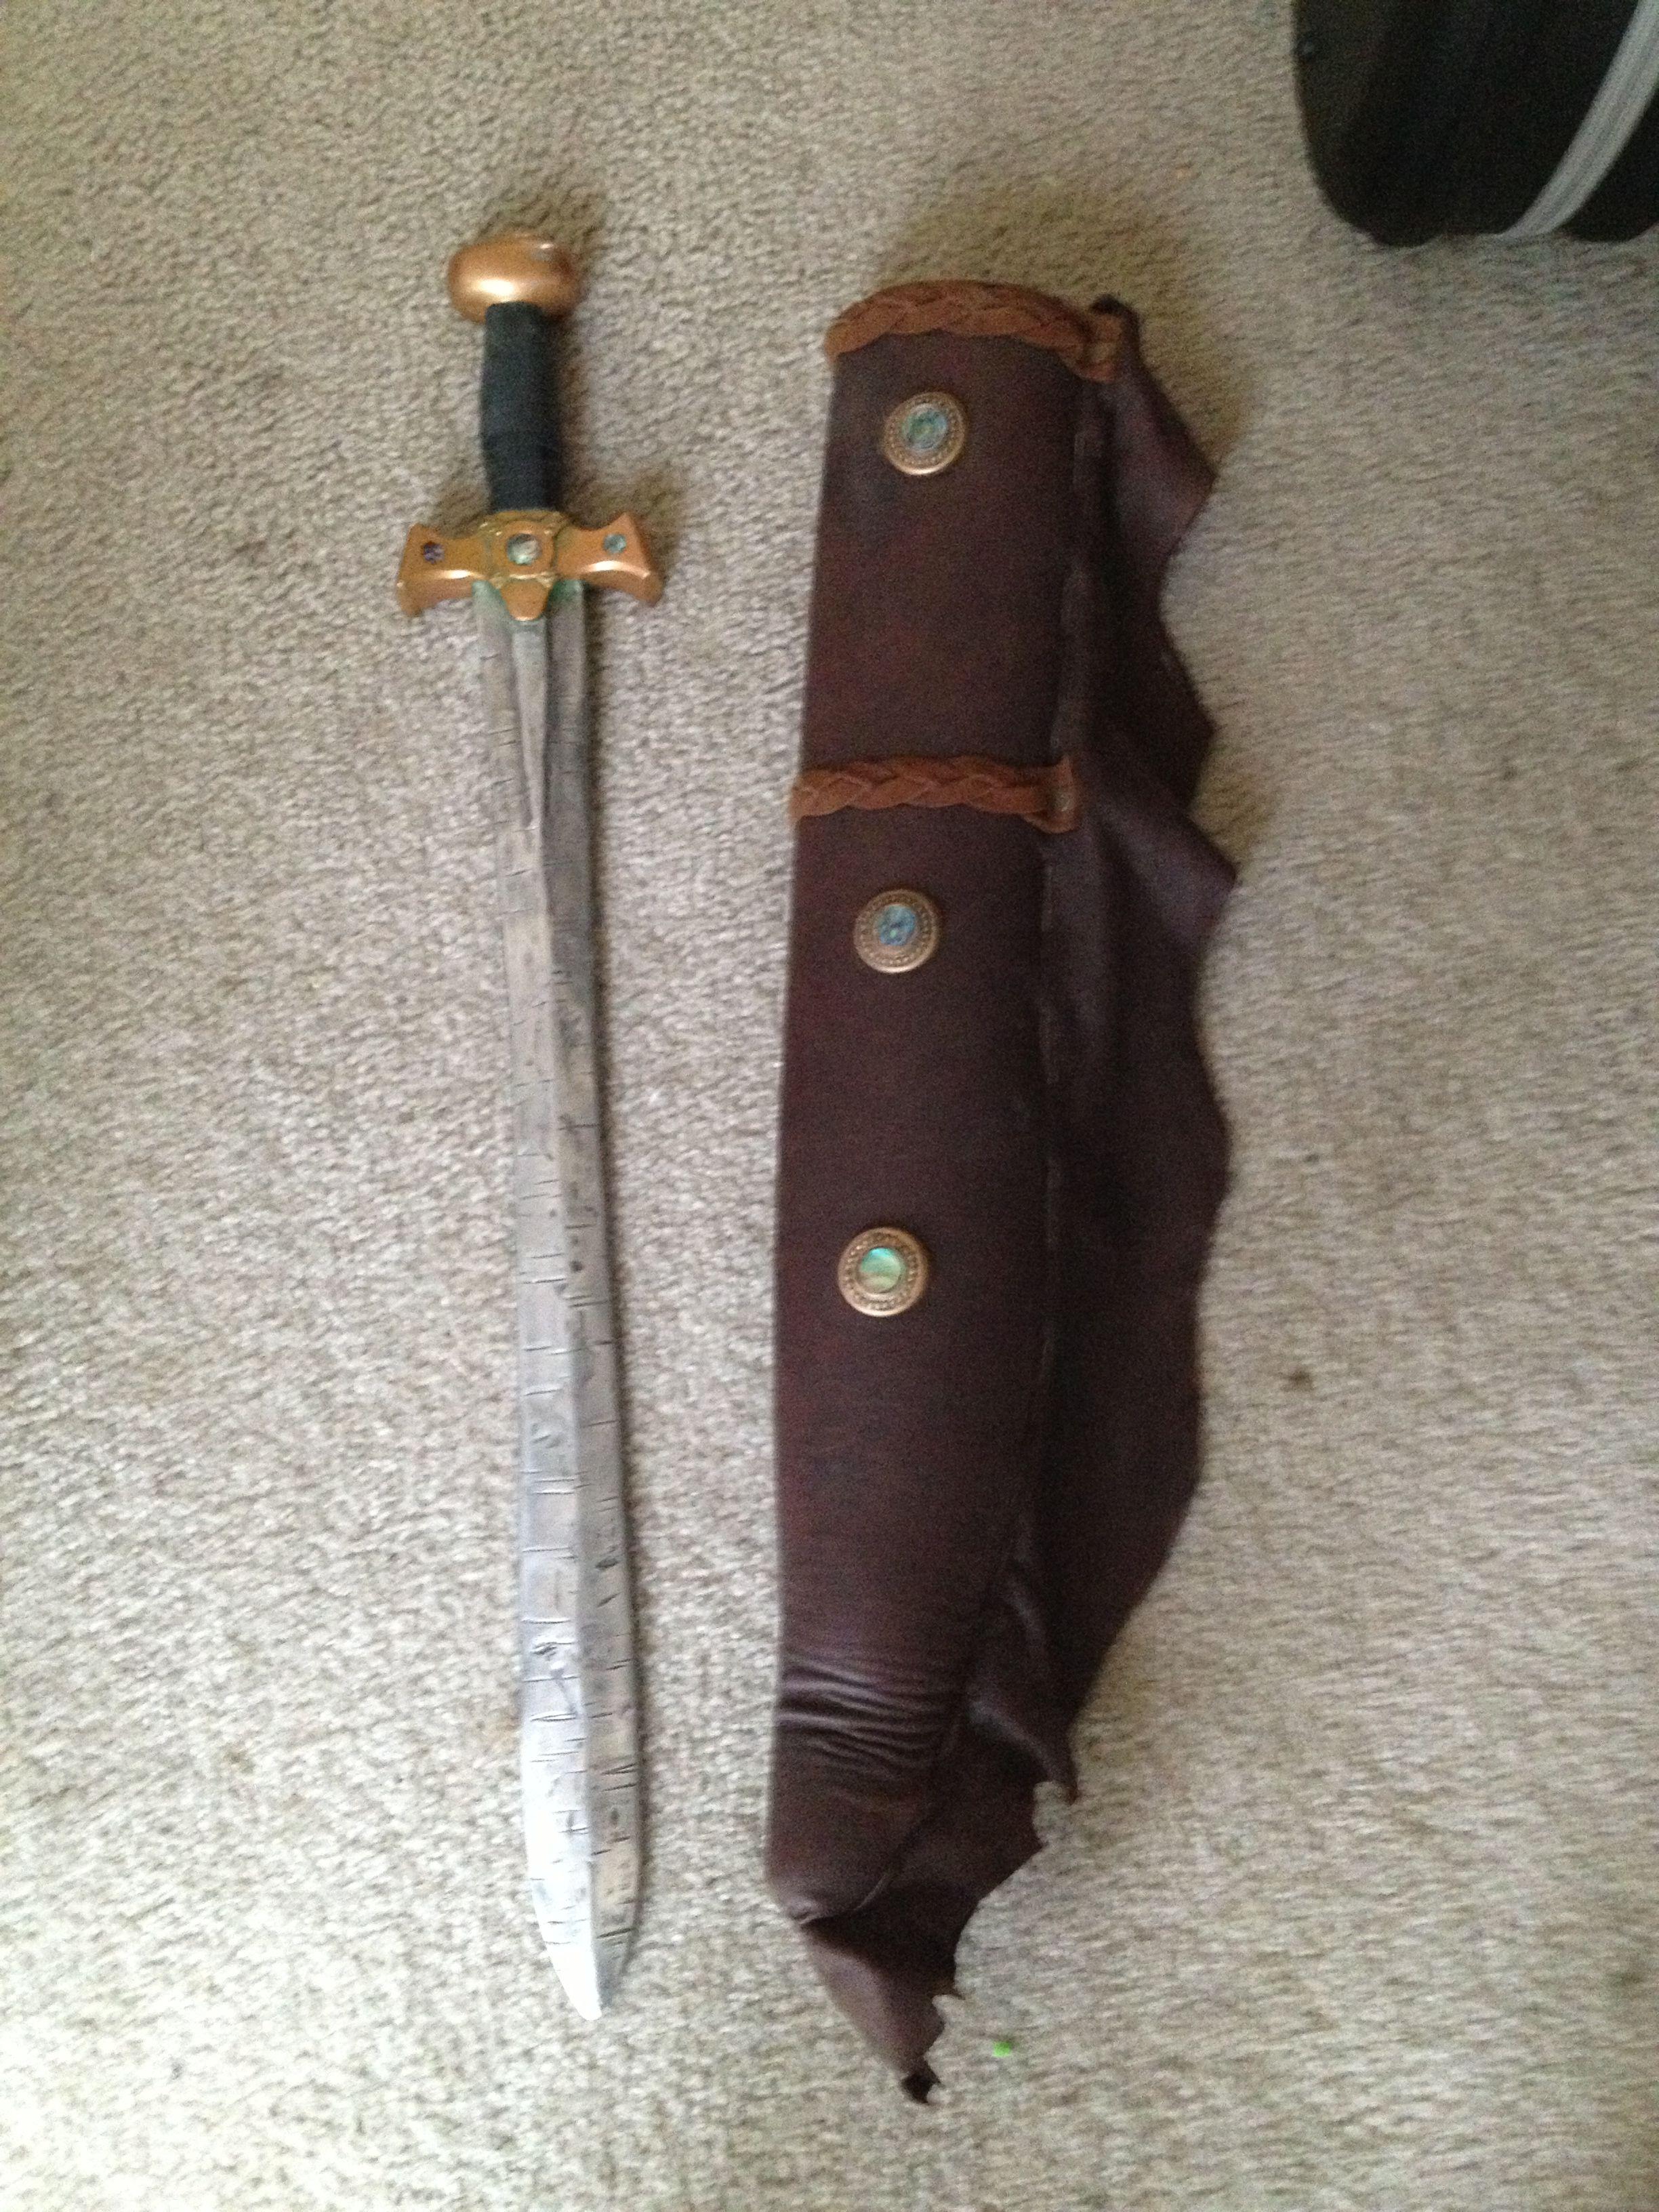 Last decent Xena replica sword and sheath I saw sell on eBay